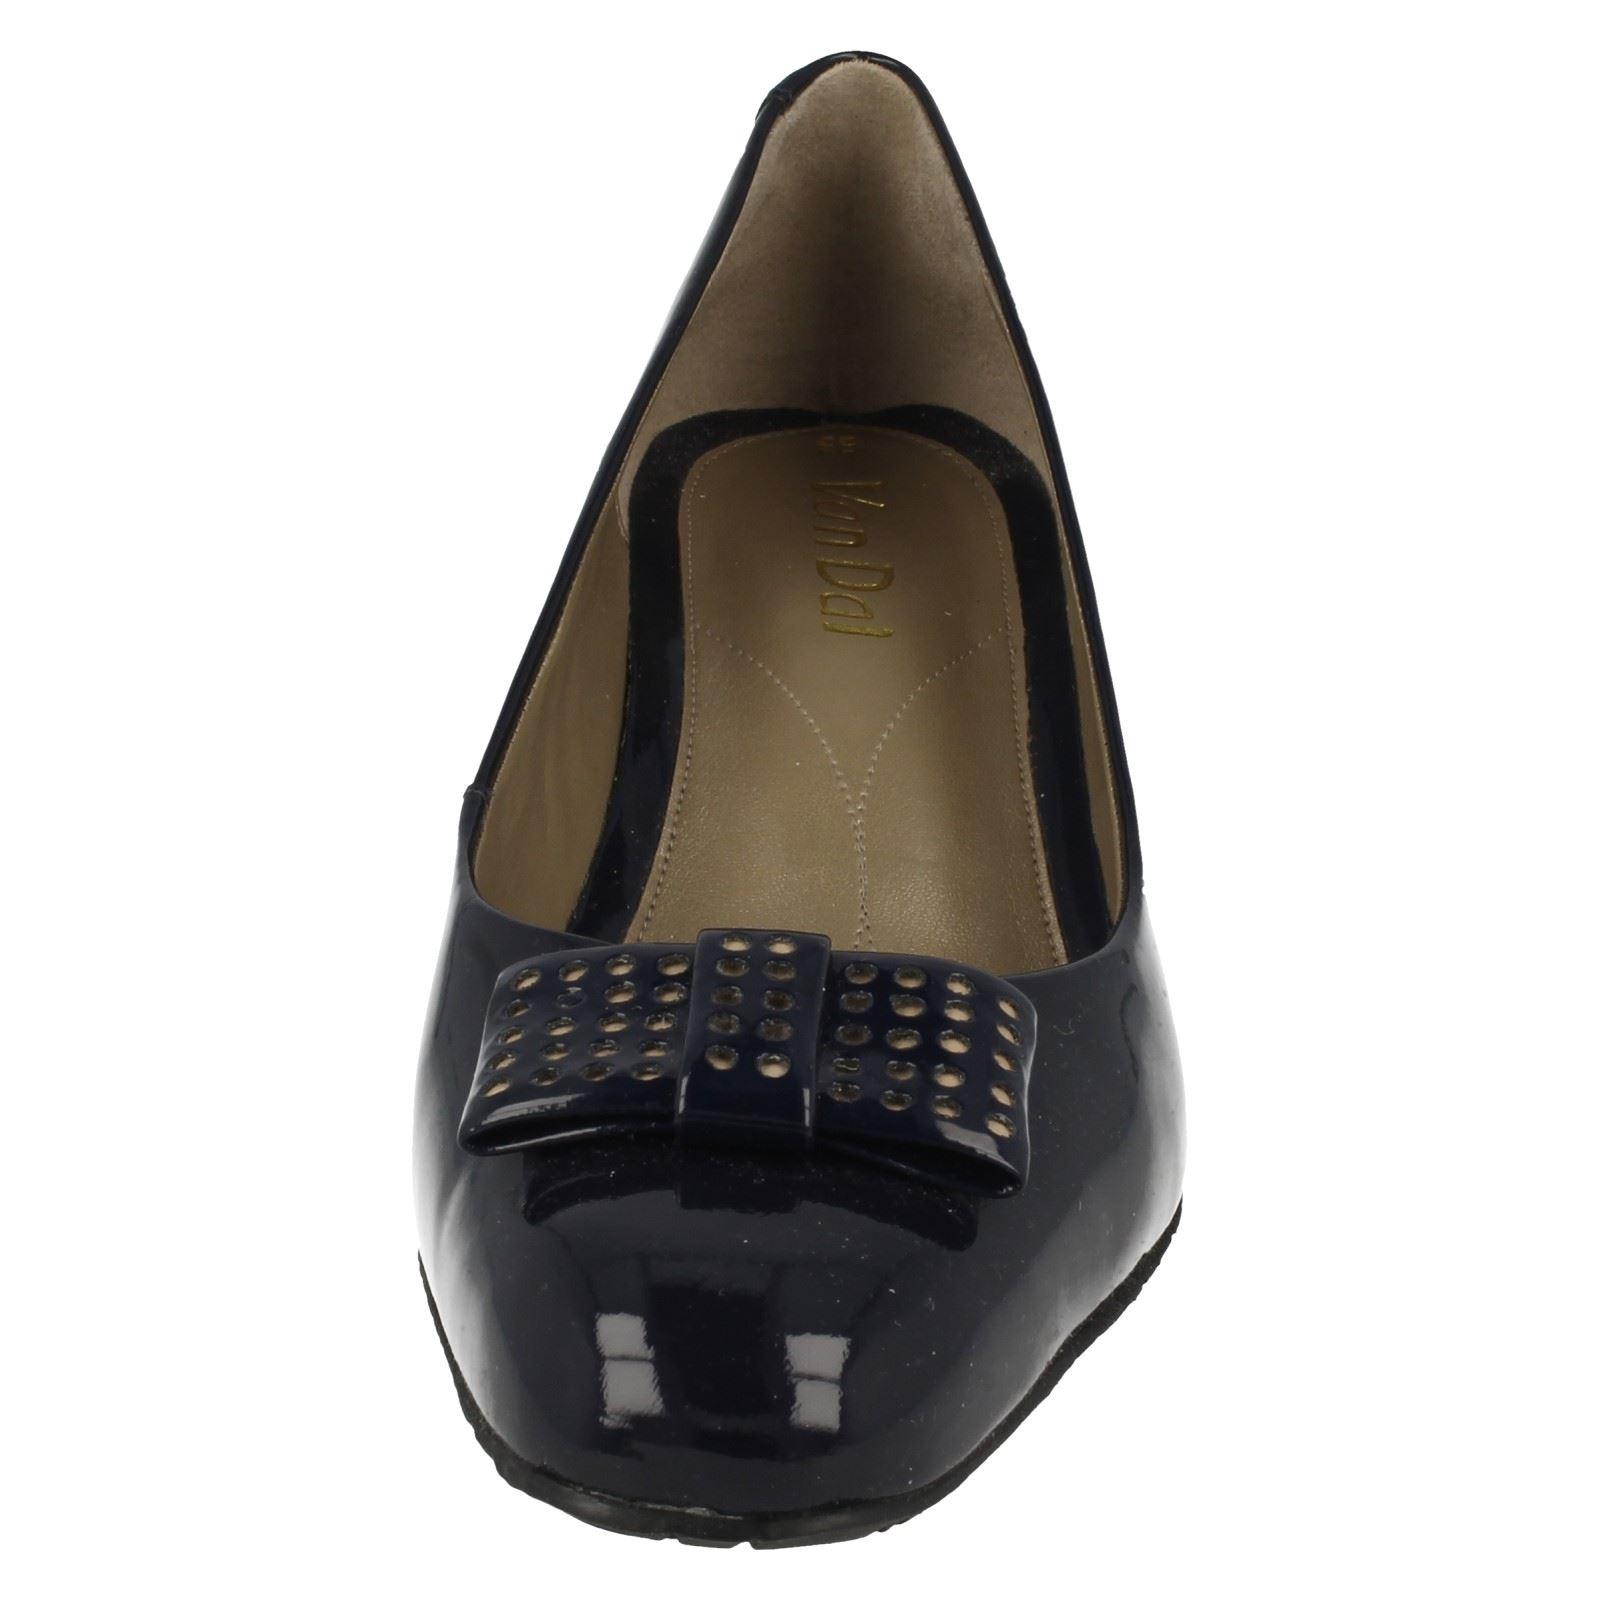 Damen Van Dal Absatz Schuhe 'Helena' 'Helena' Schuhe a4e9f4